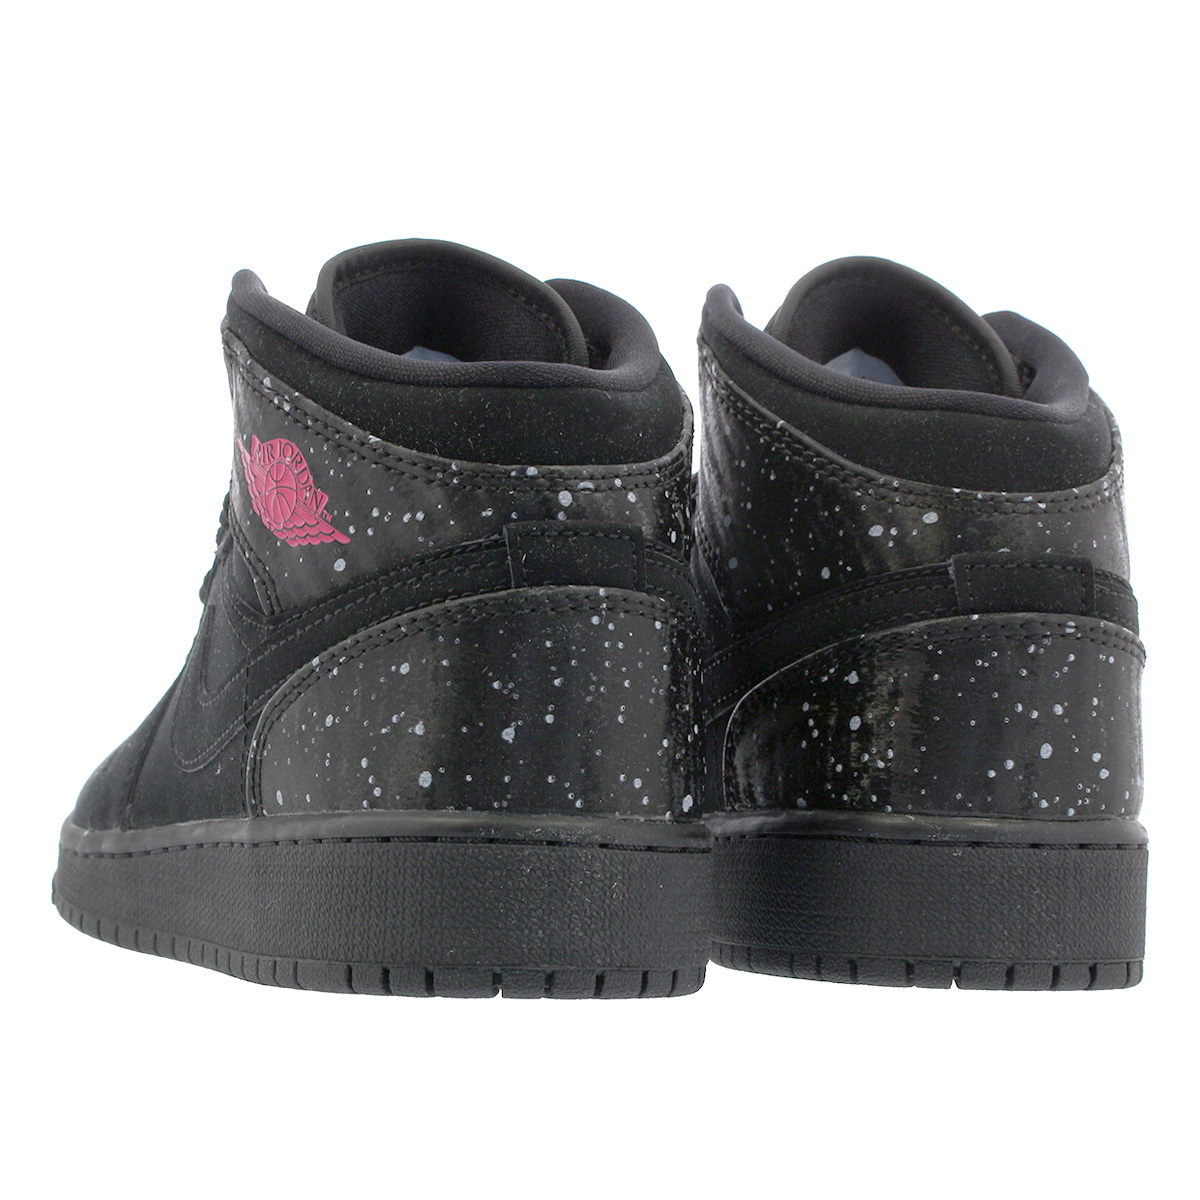 d76a10e8d1f6 NIKE AIR JORDAN 1 MID GG Nike Air Jordan 1 mid GG BLACK WHITE RUSH PINK  555